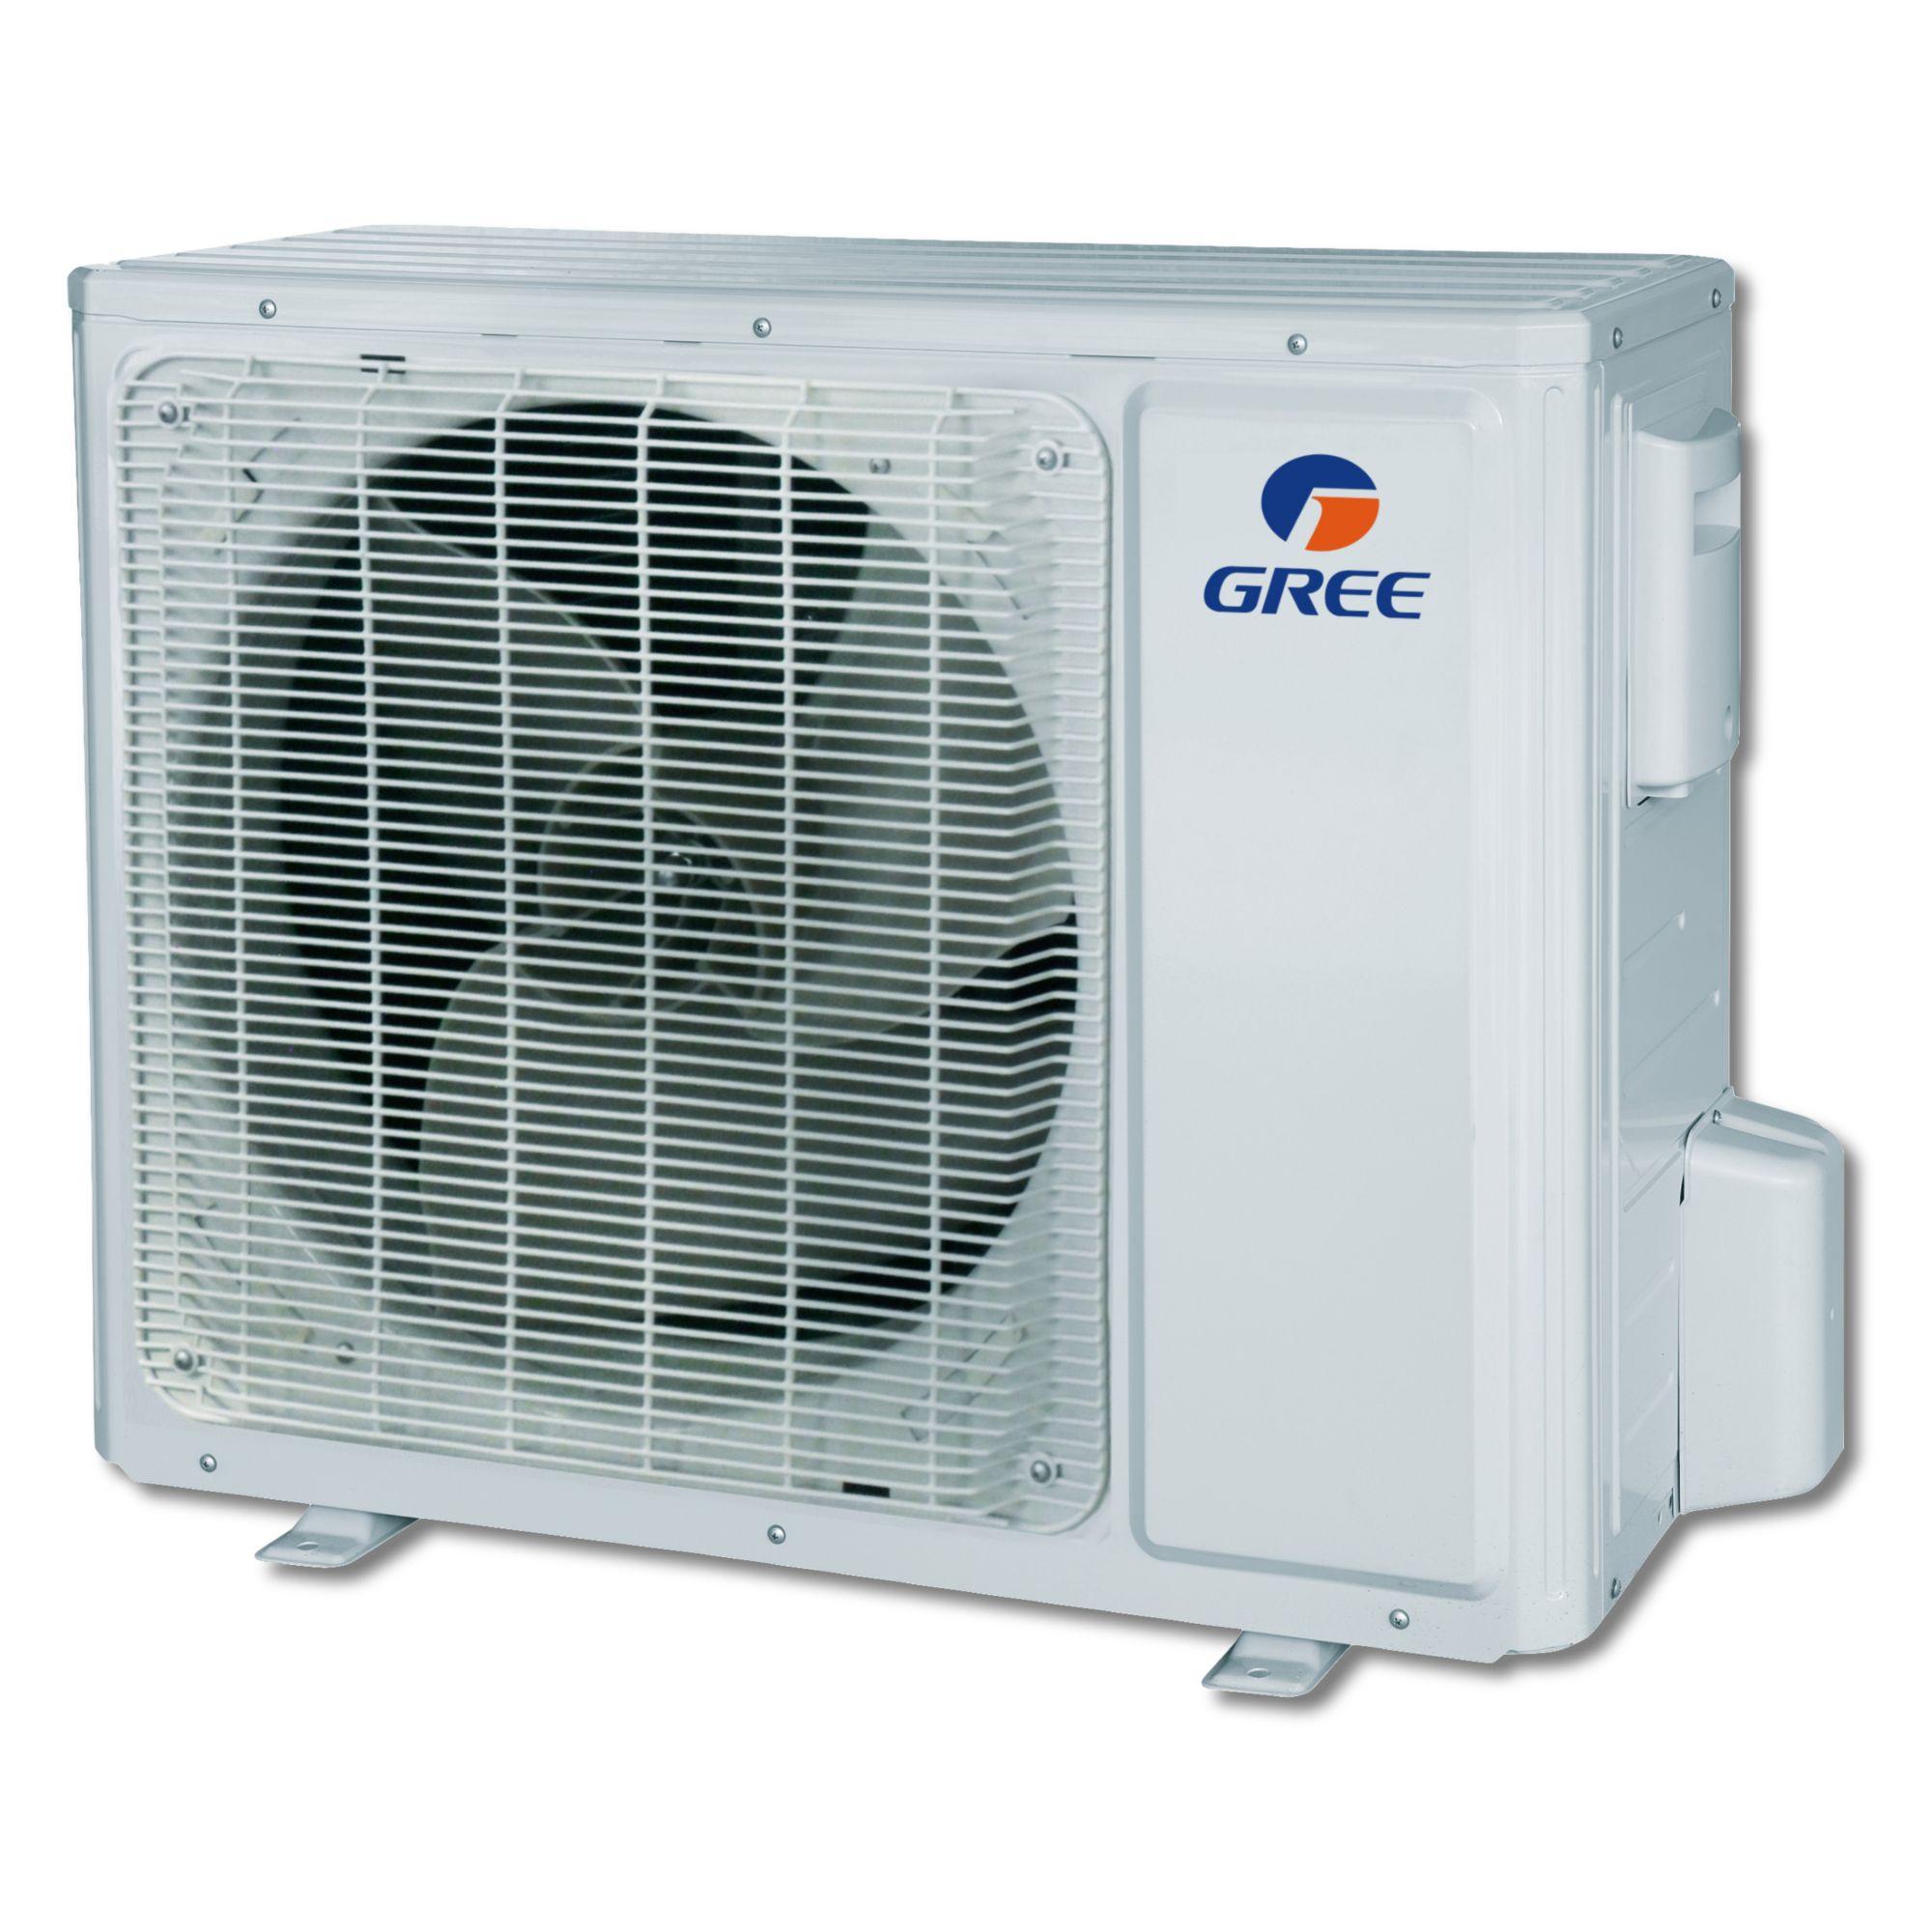 ... Gree UMAT18HP230V1AD-S - 18,000 BTU 16 SEER Concealed Duct Mini Split Air Conditioner Heat